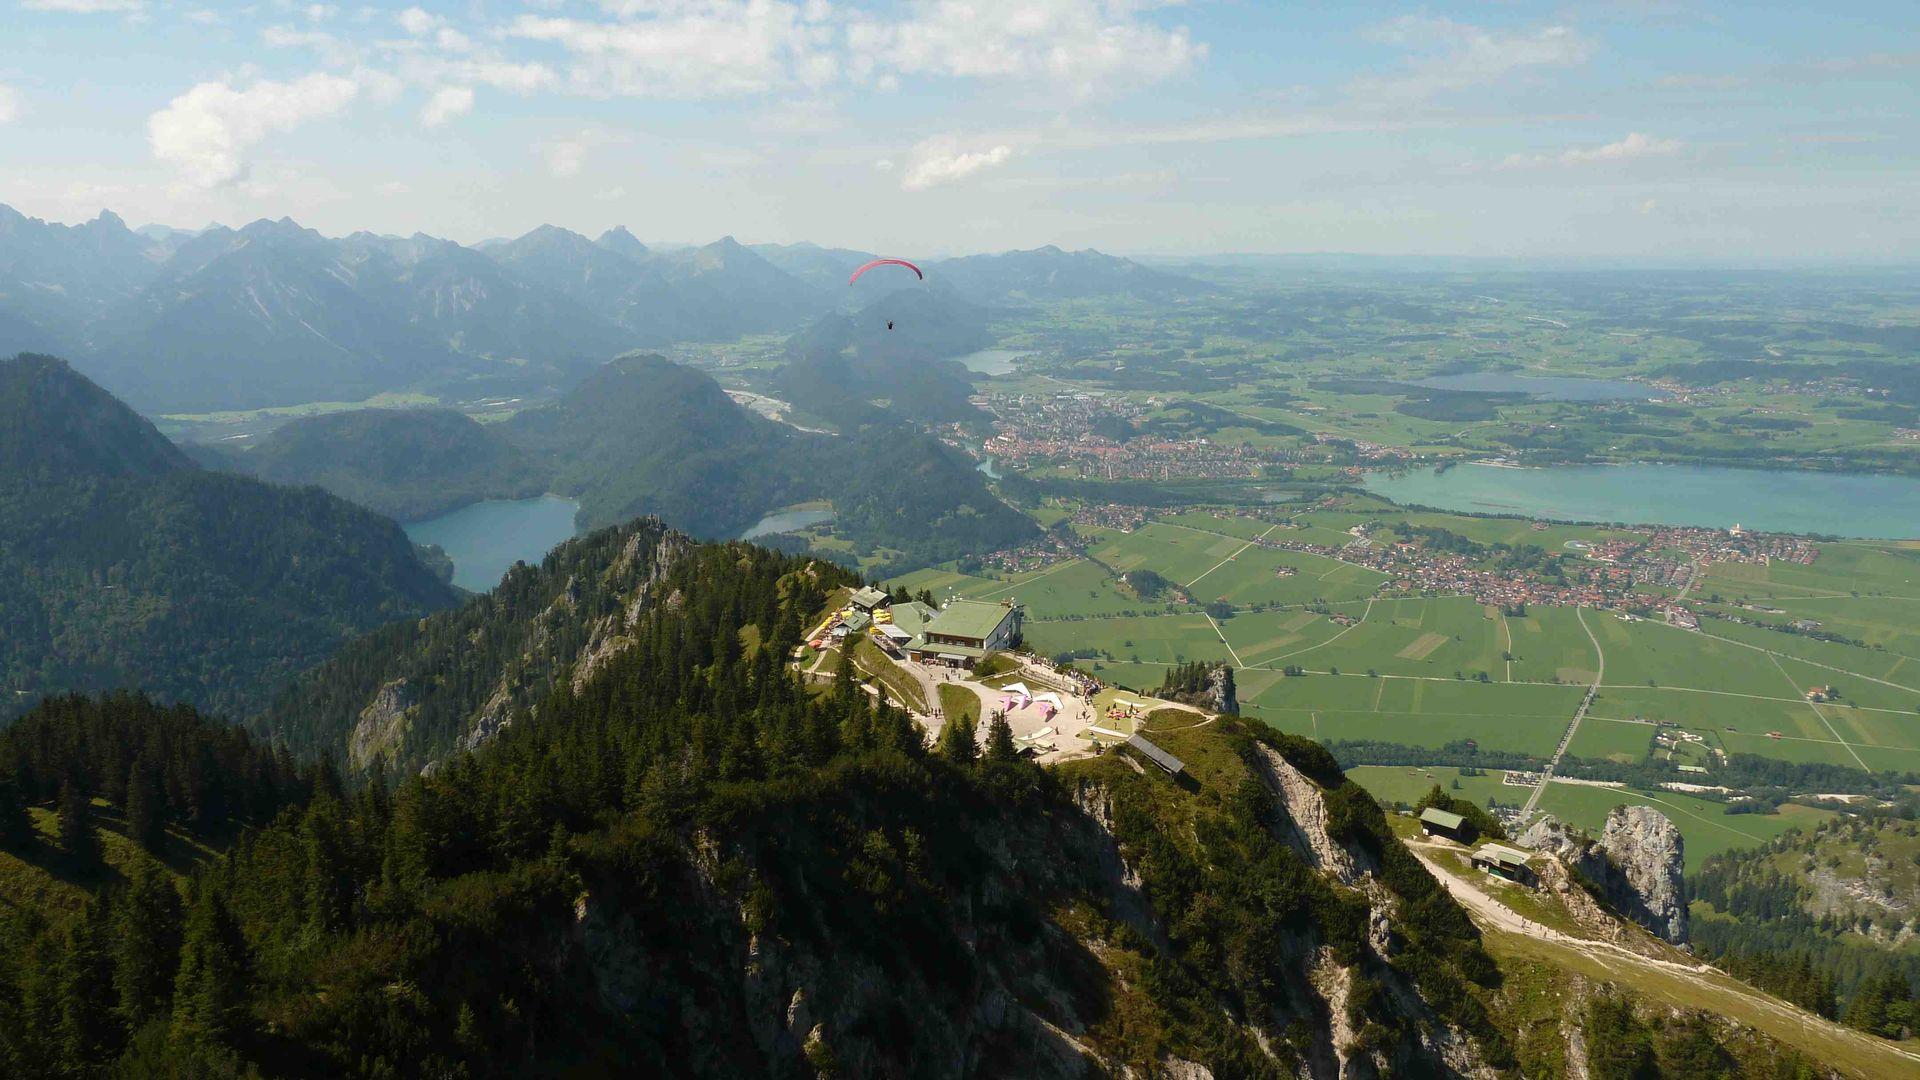 Tegelbergbahn Startseite Eng Europe Vacation Natural Landmarks Vacation